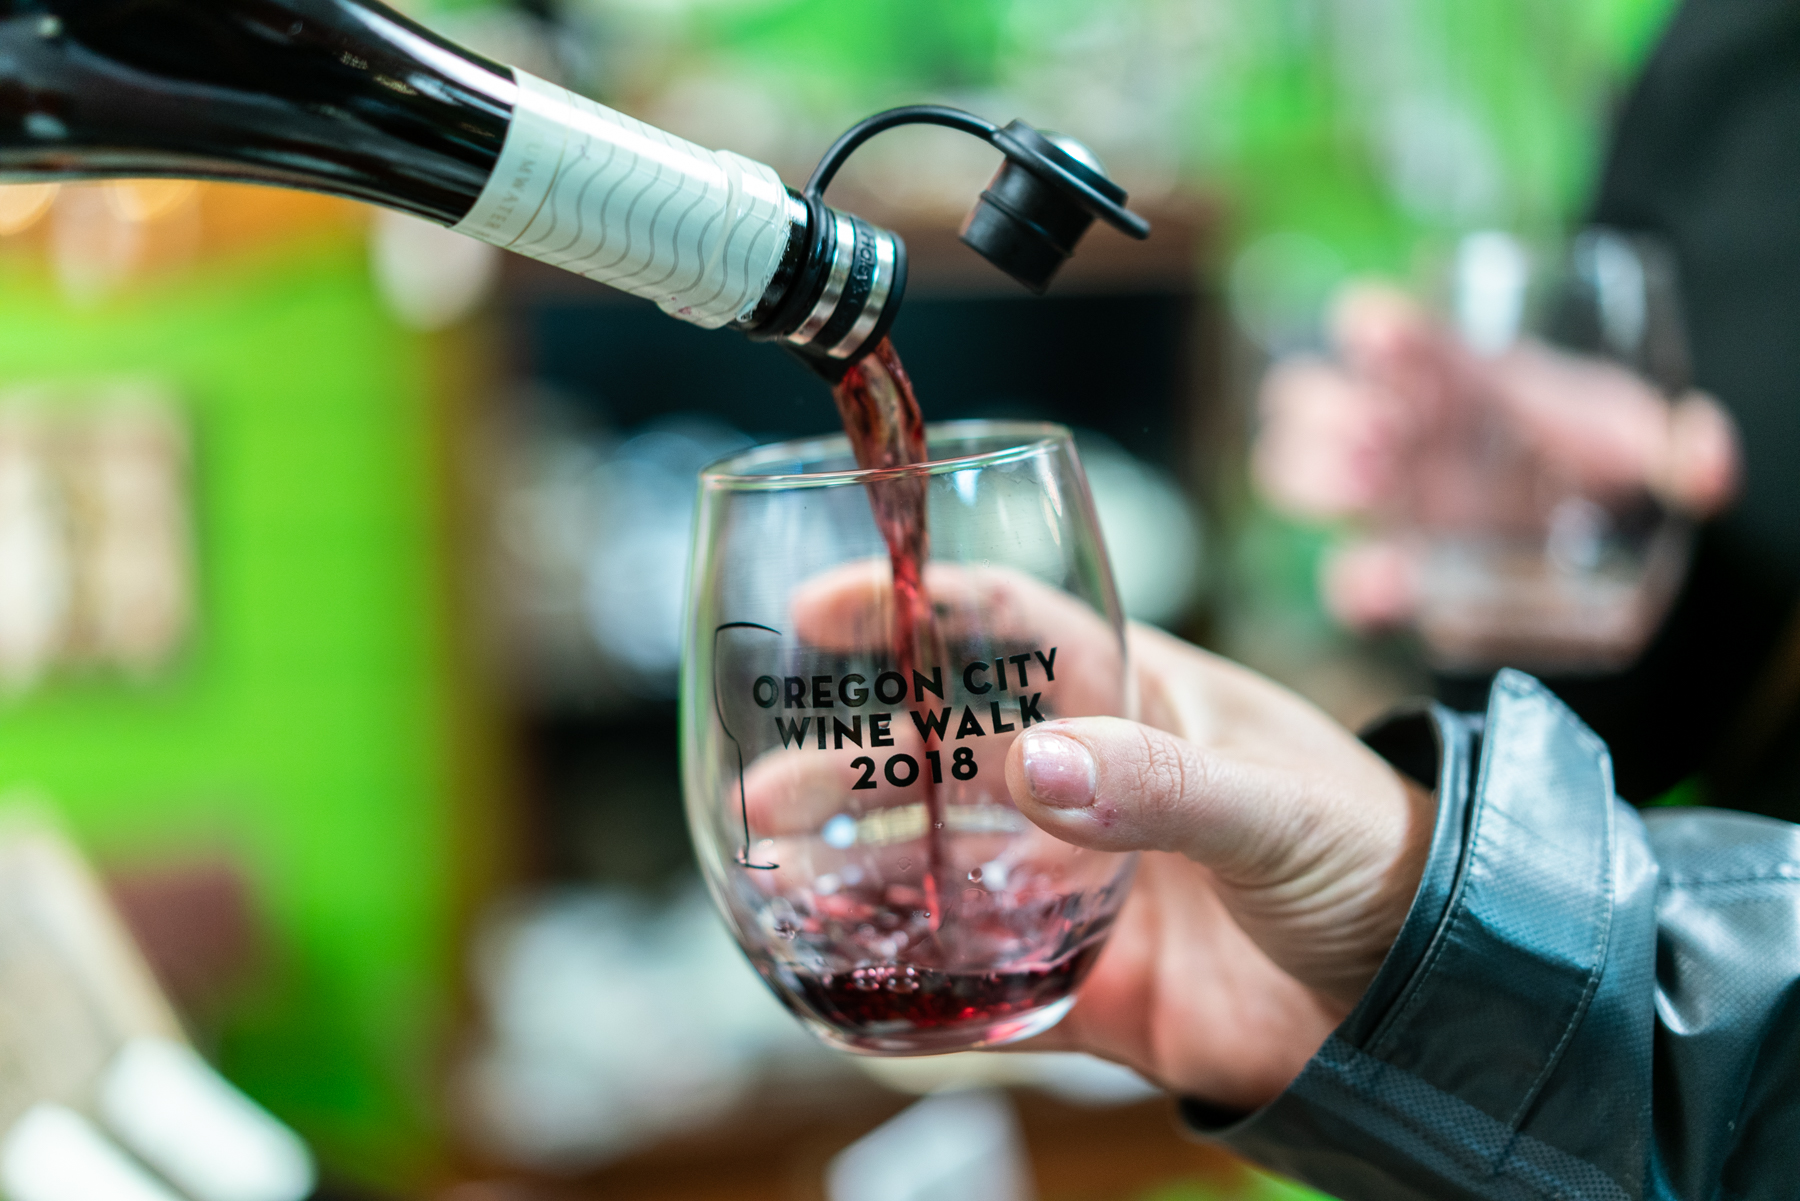 110818-Downtown-Oregon-City-Wine-Walkp-2018-Final-Select-LoRes-44.jpg